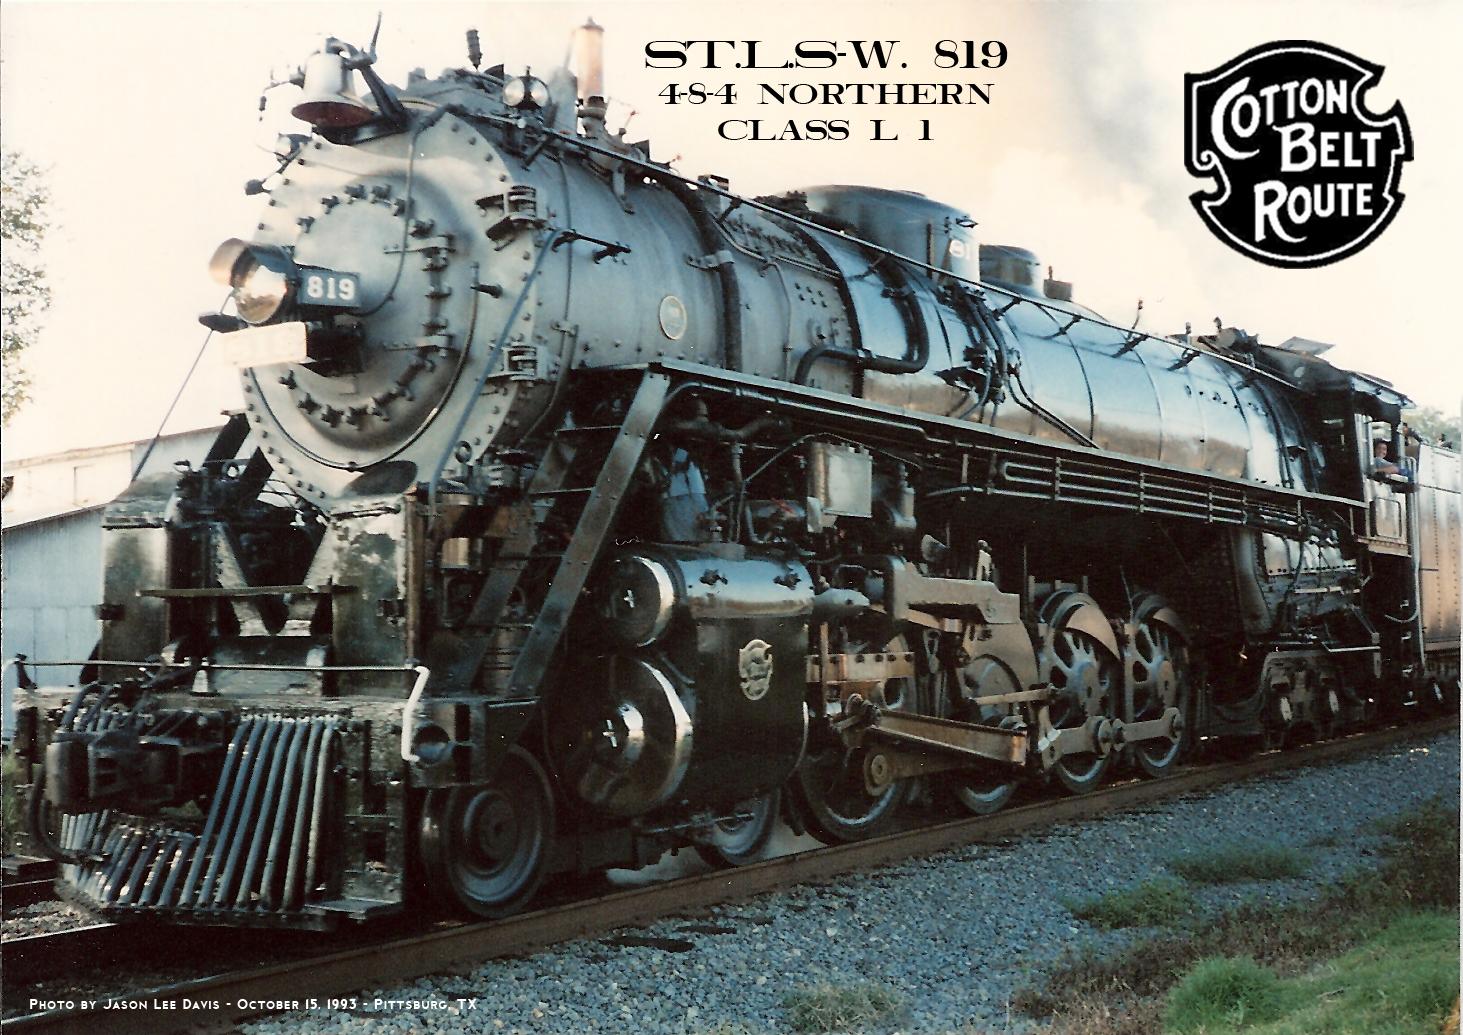 Jld931015-16-SSW819-Pittsburg,TX-2.jpg